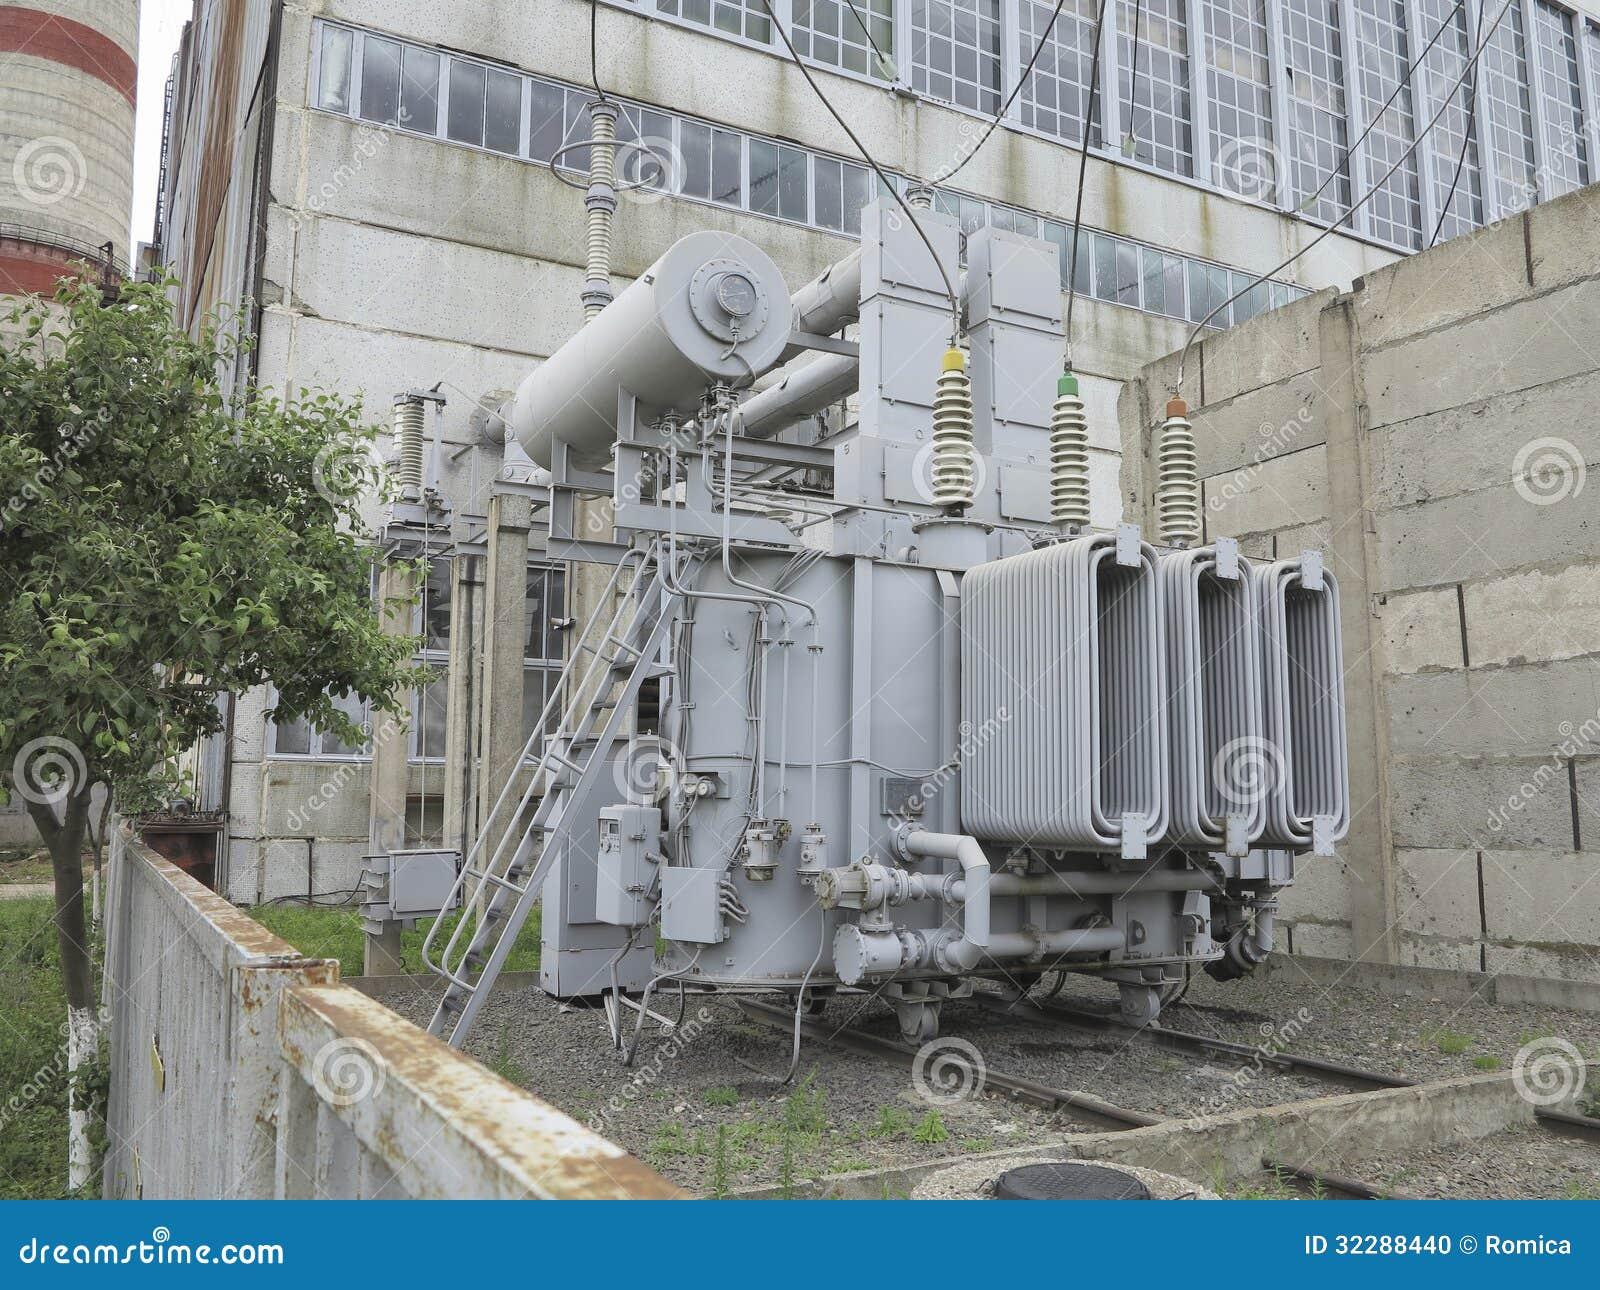 Stock Photo Huge Industrial High Voltage Substation Power Transformer Rai Rails Plant Image32288440